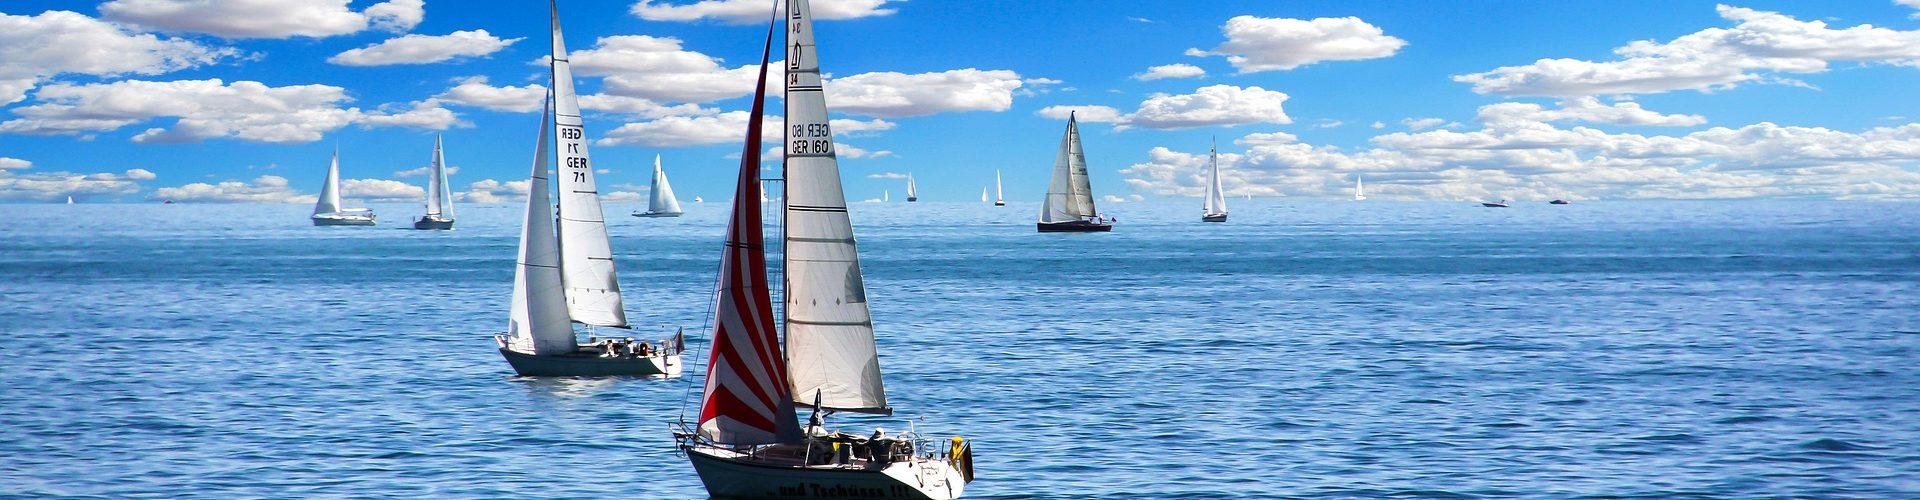 segeln lernen in Bad Bederkesa segelschein machen in Bad Bederkesa 1920x500 - Segeln lernen in Bad Bederkesa